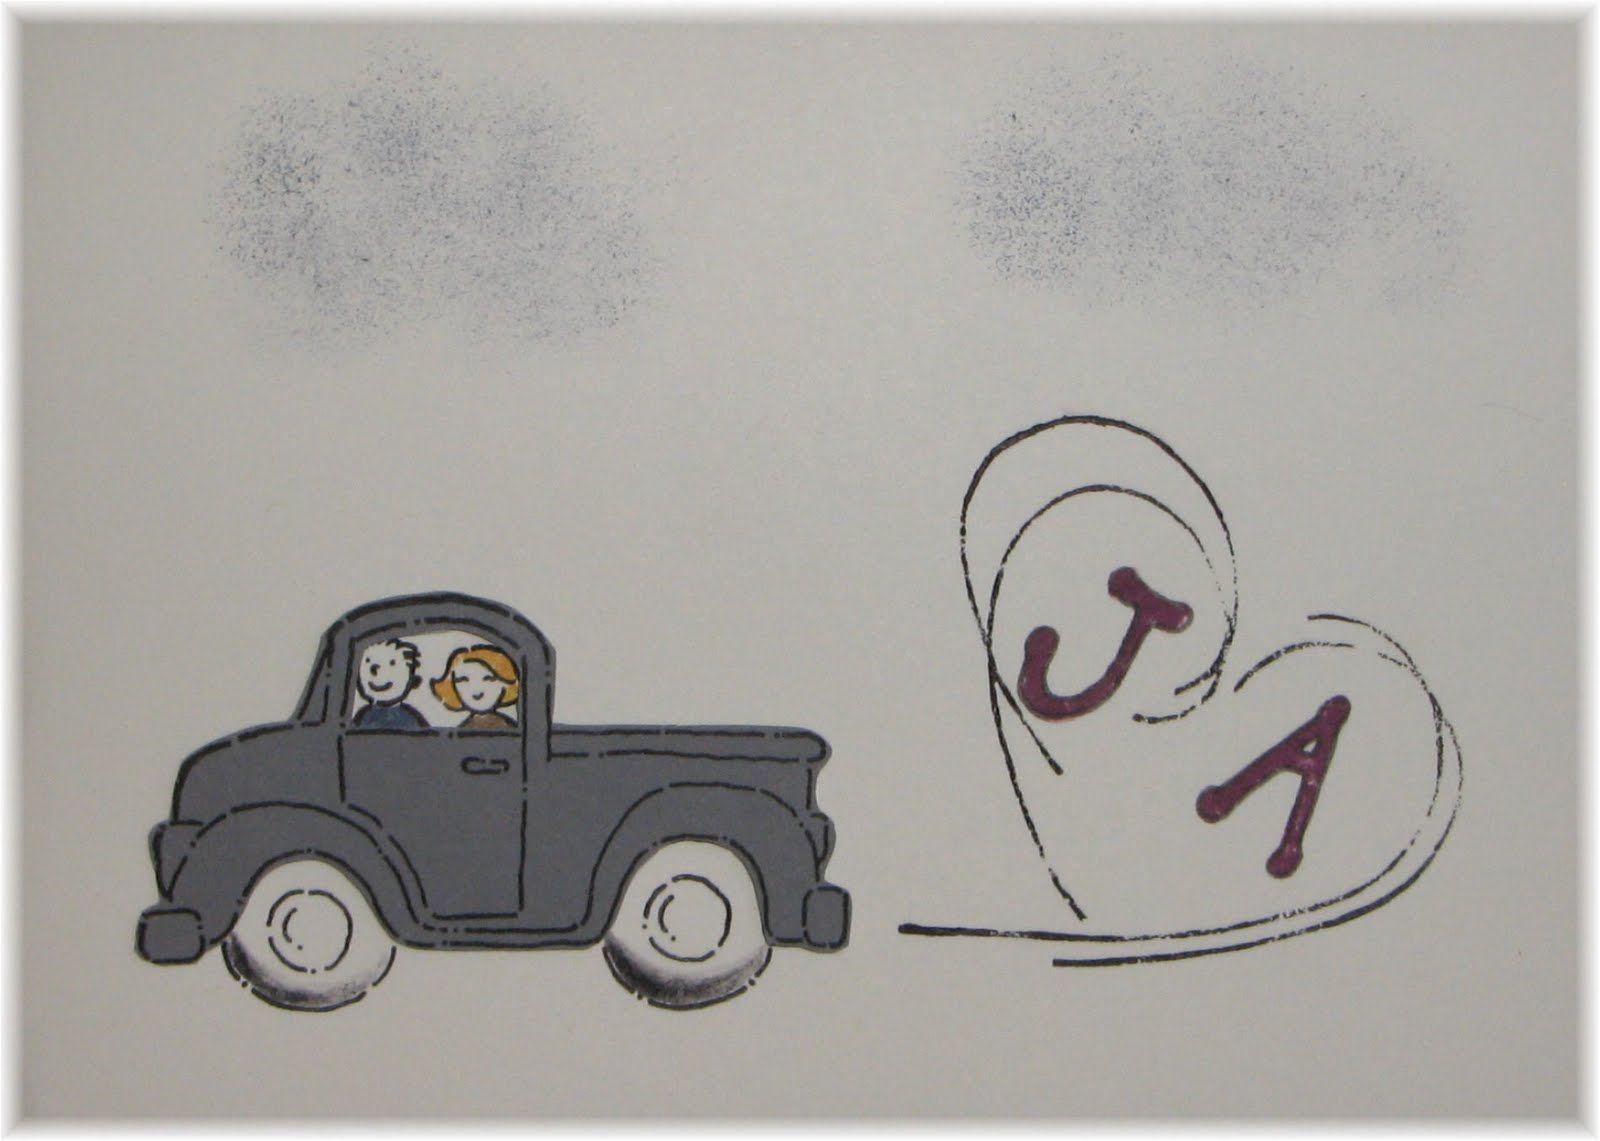 Sigrids kreative ART: Hochzeitskartenfieber